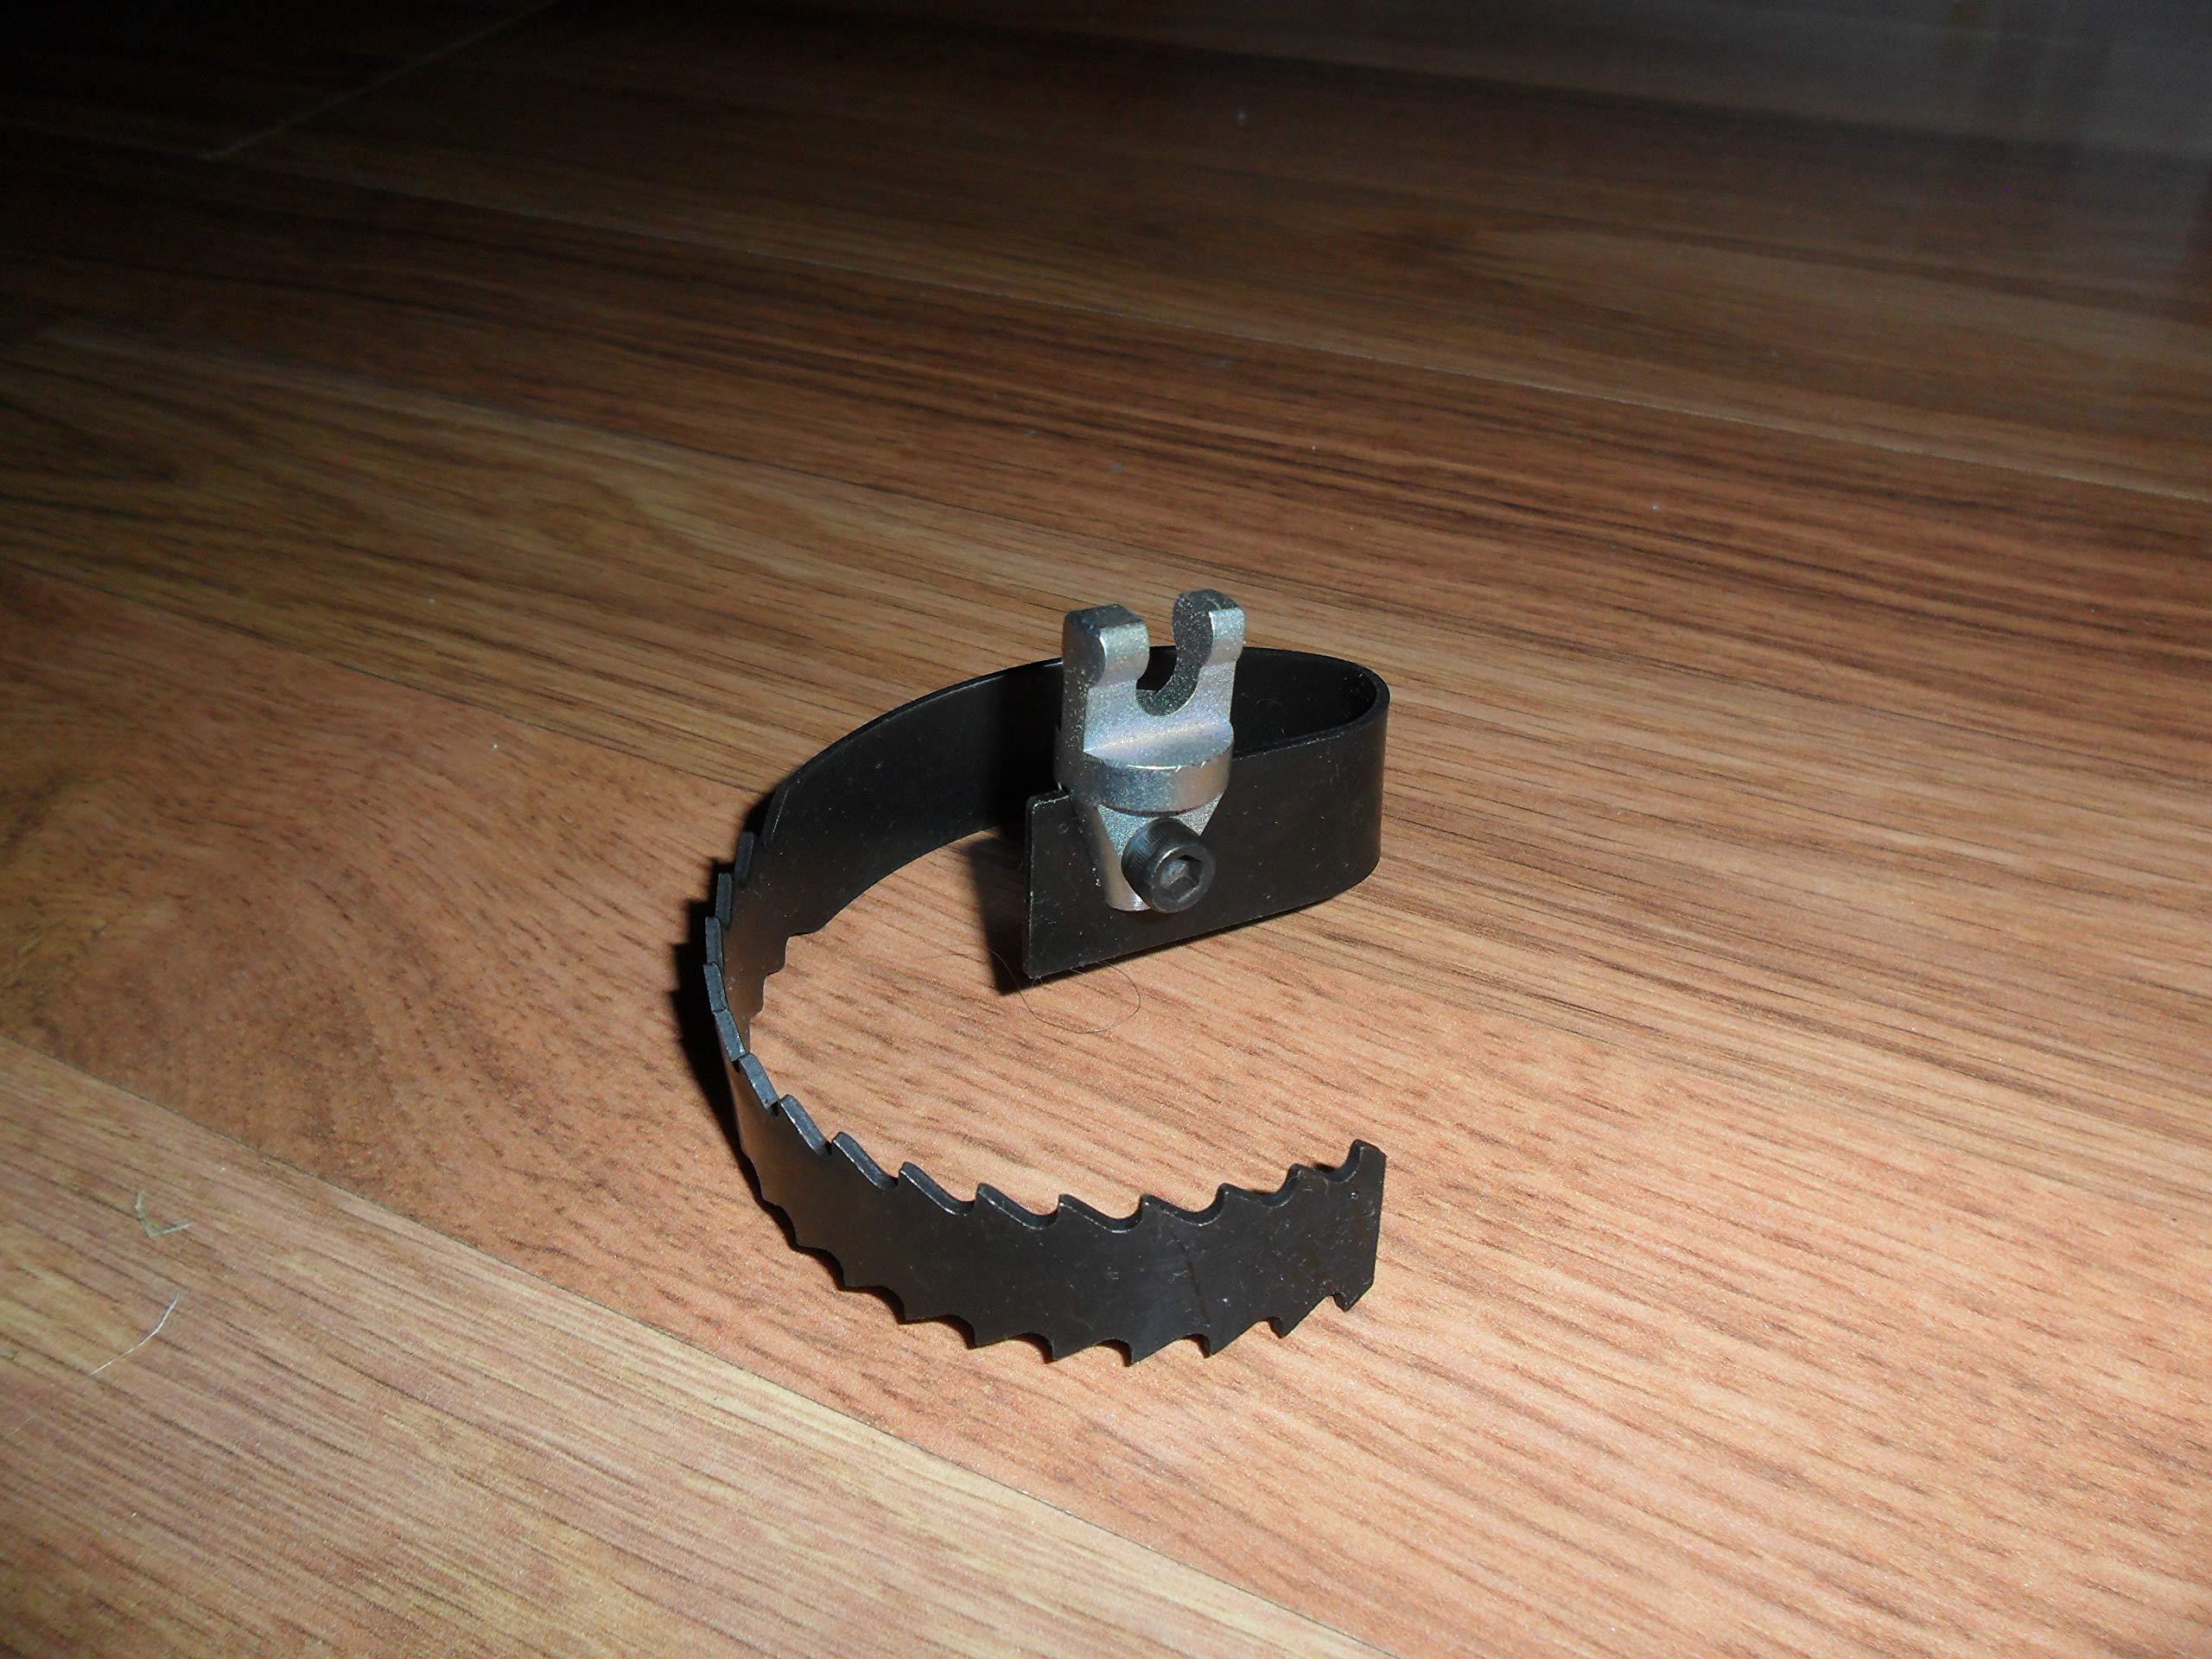 Ridgid 92505 T-408 Sawtooth Cutter